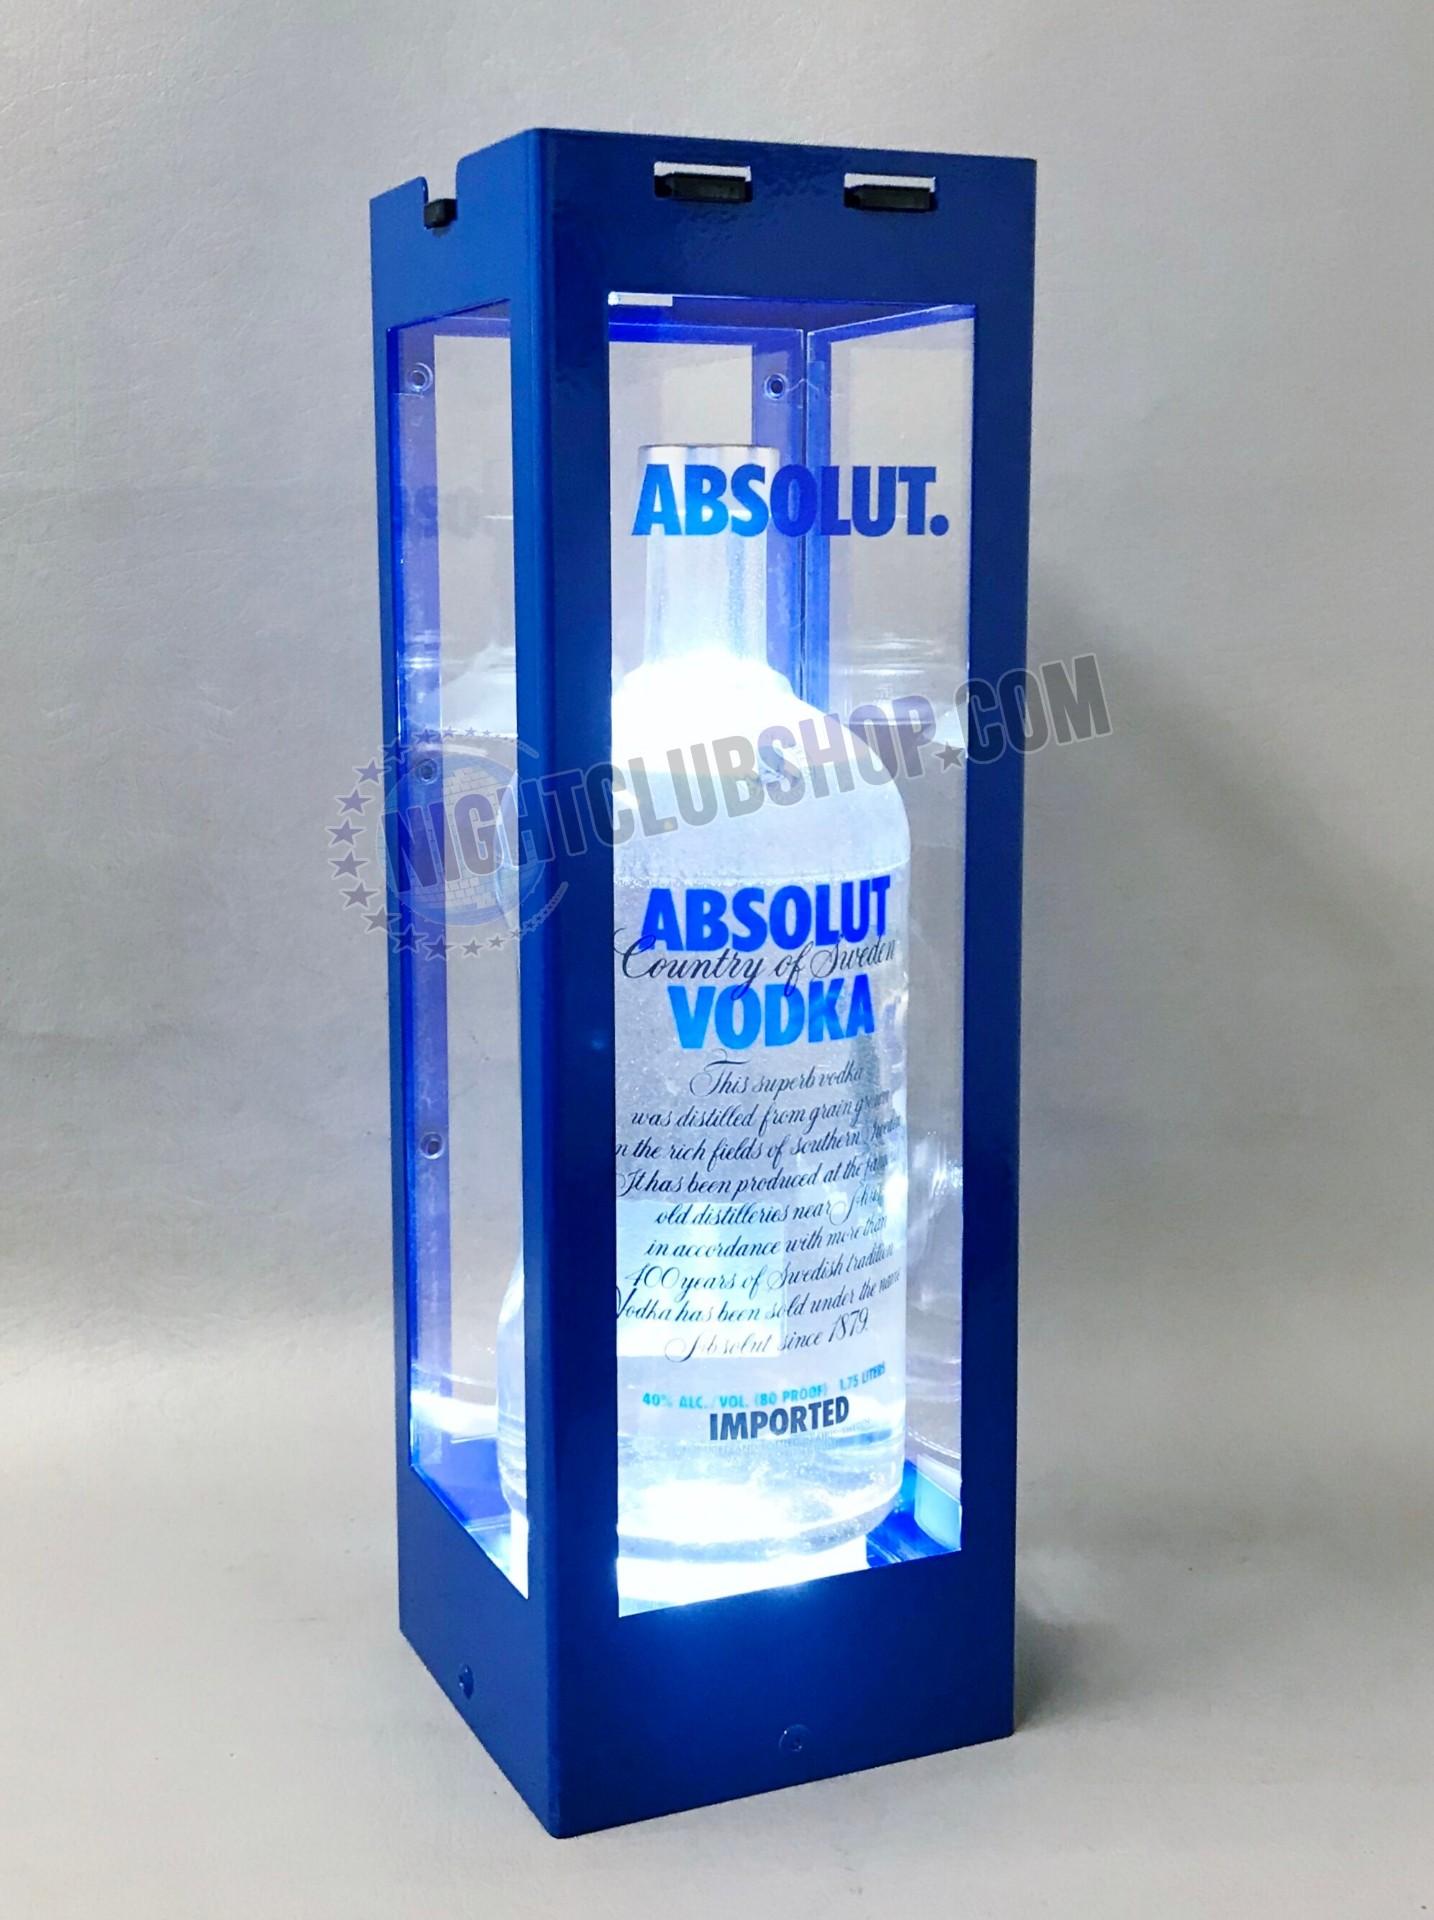 1-tagged-window-bottle-lock-cage-display-dmxr-remote-control-led-lock-box-.jpg